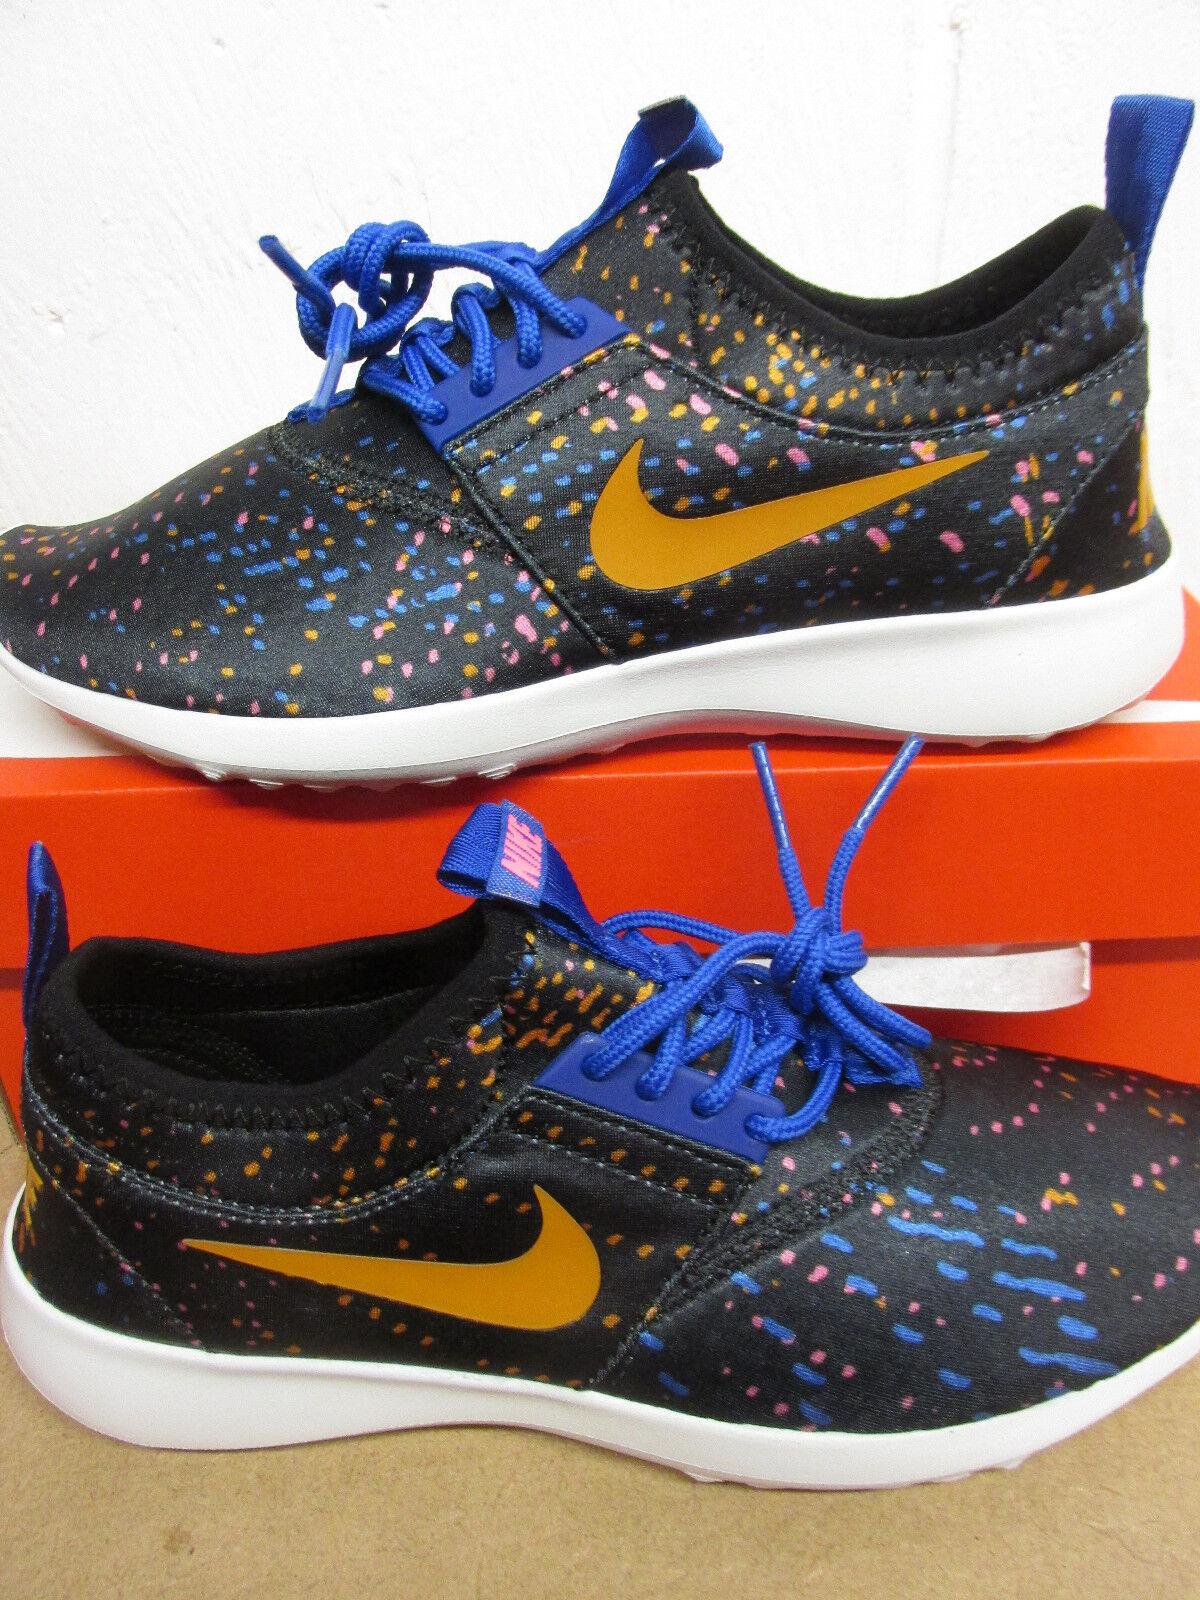 nike Damenss juvenate print running trainers 749552 004 sneakers schuhe